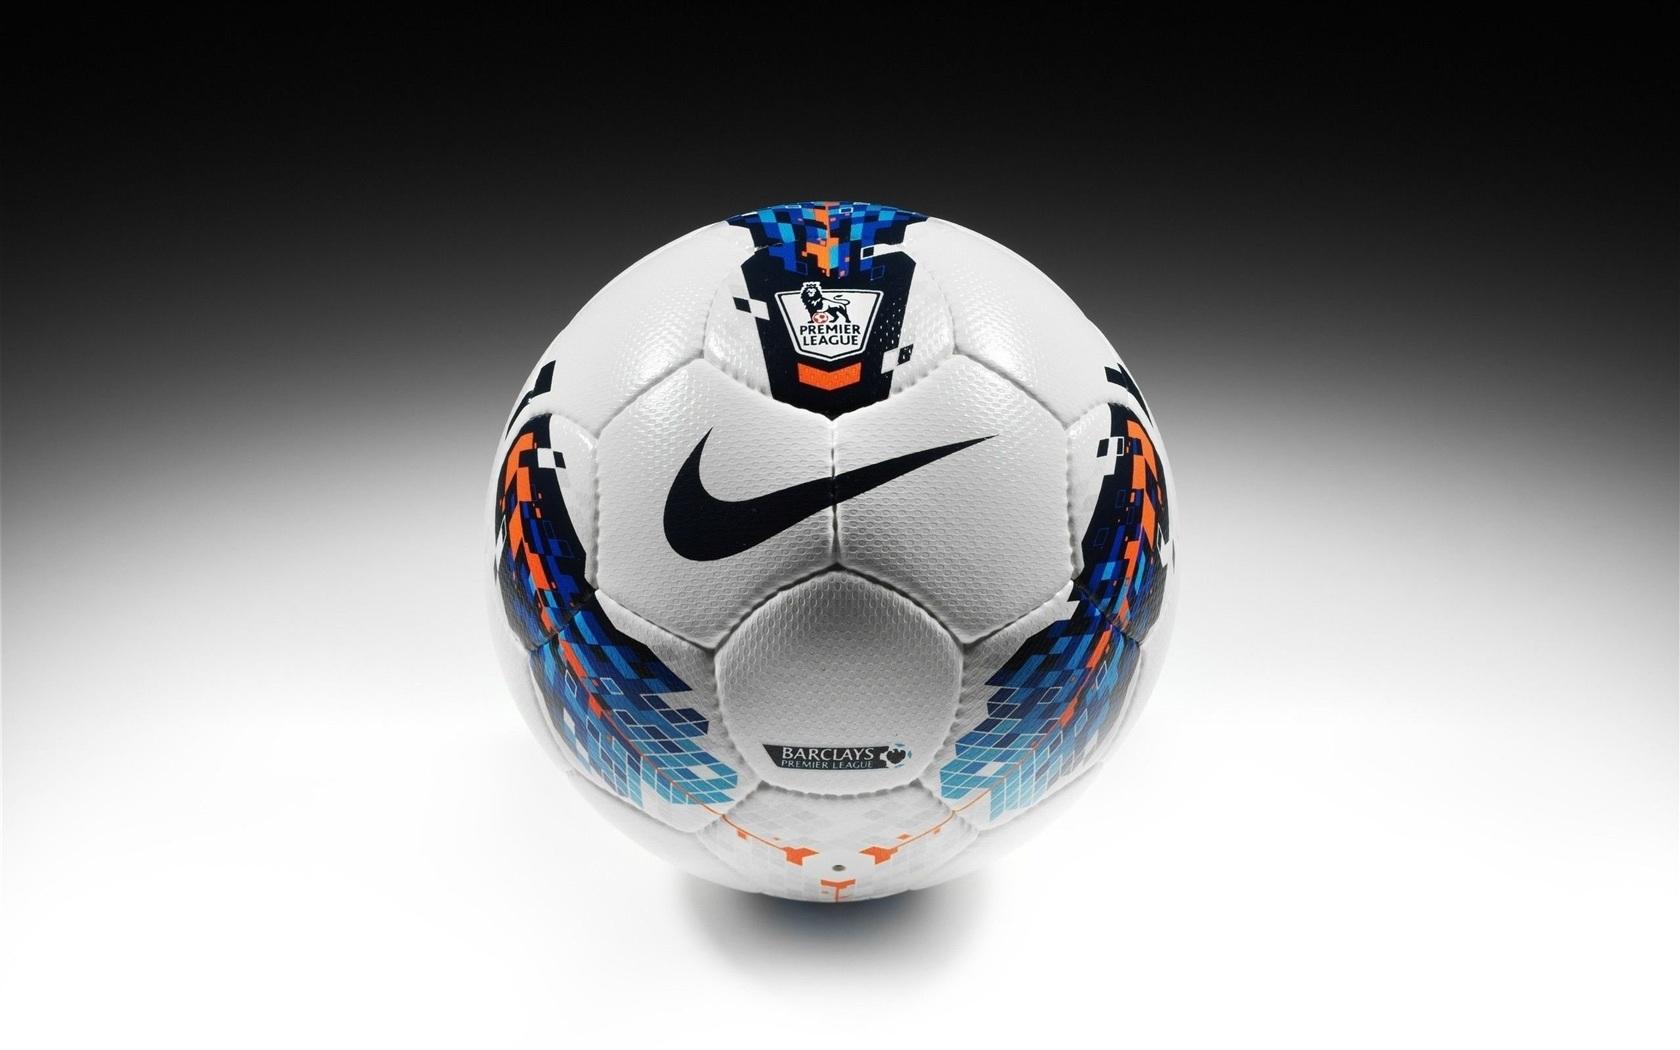 Football Wallpaper 10 1400 X 1209: Premier League De Football Nike Fonds D'écran